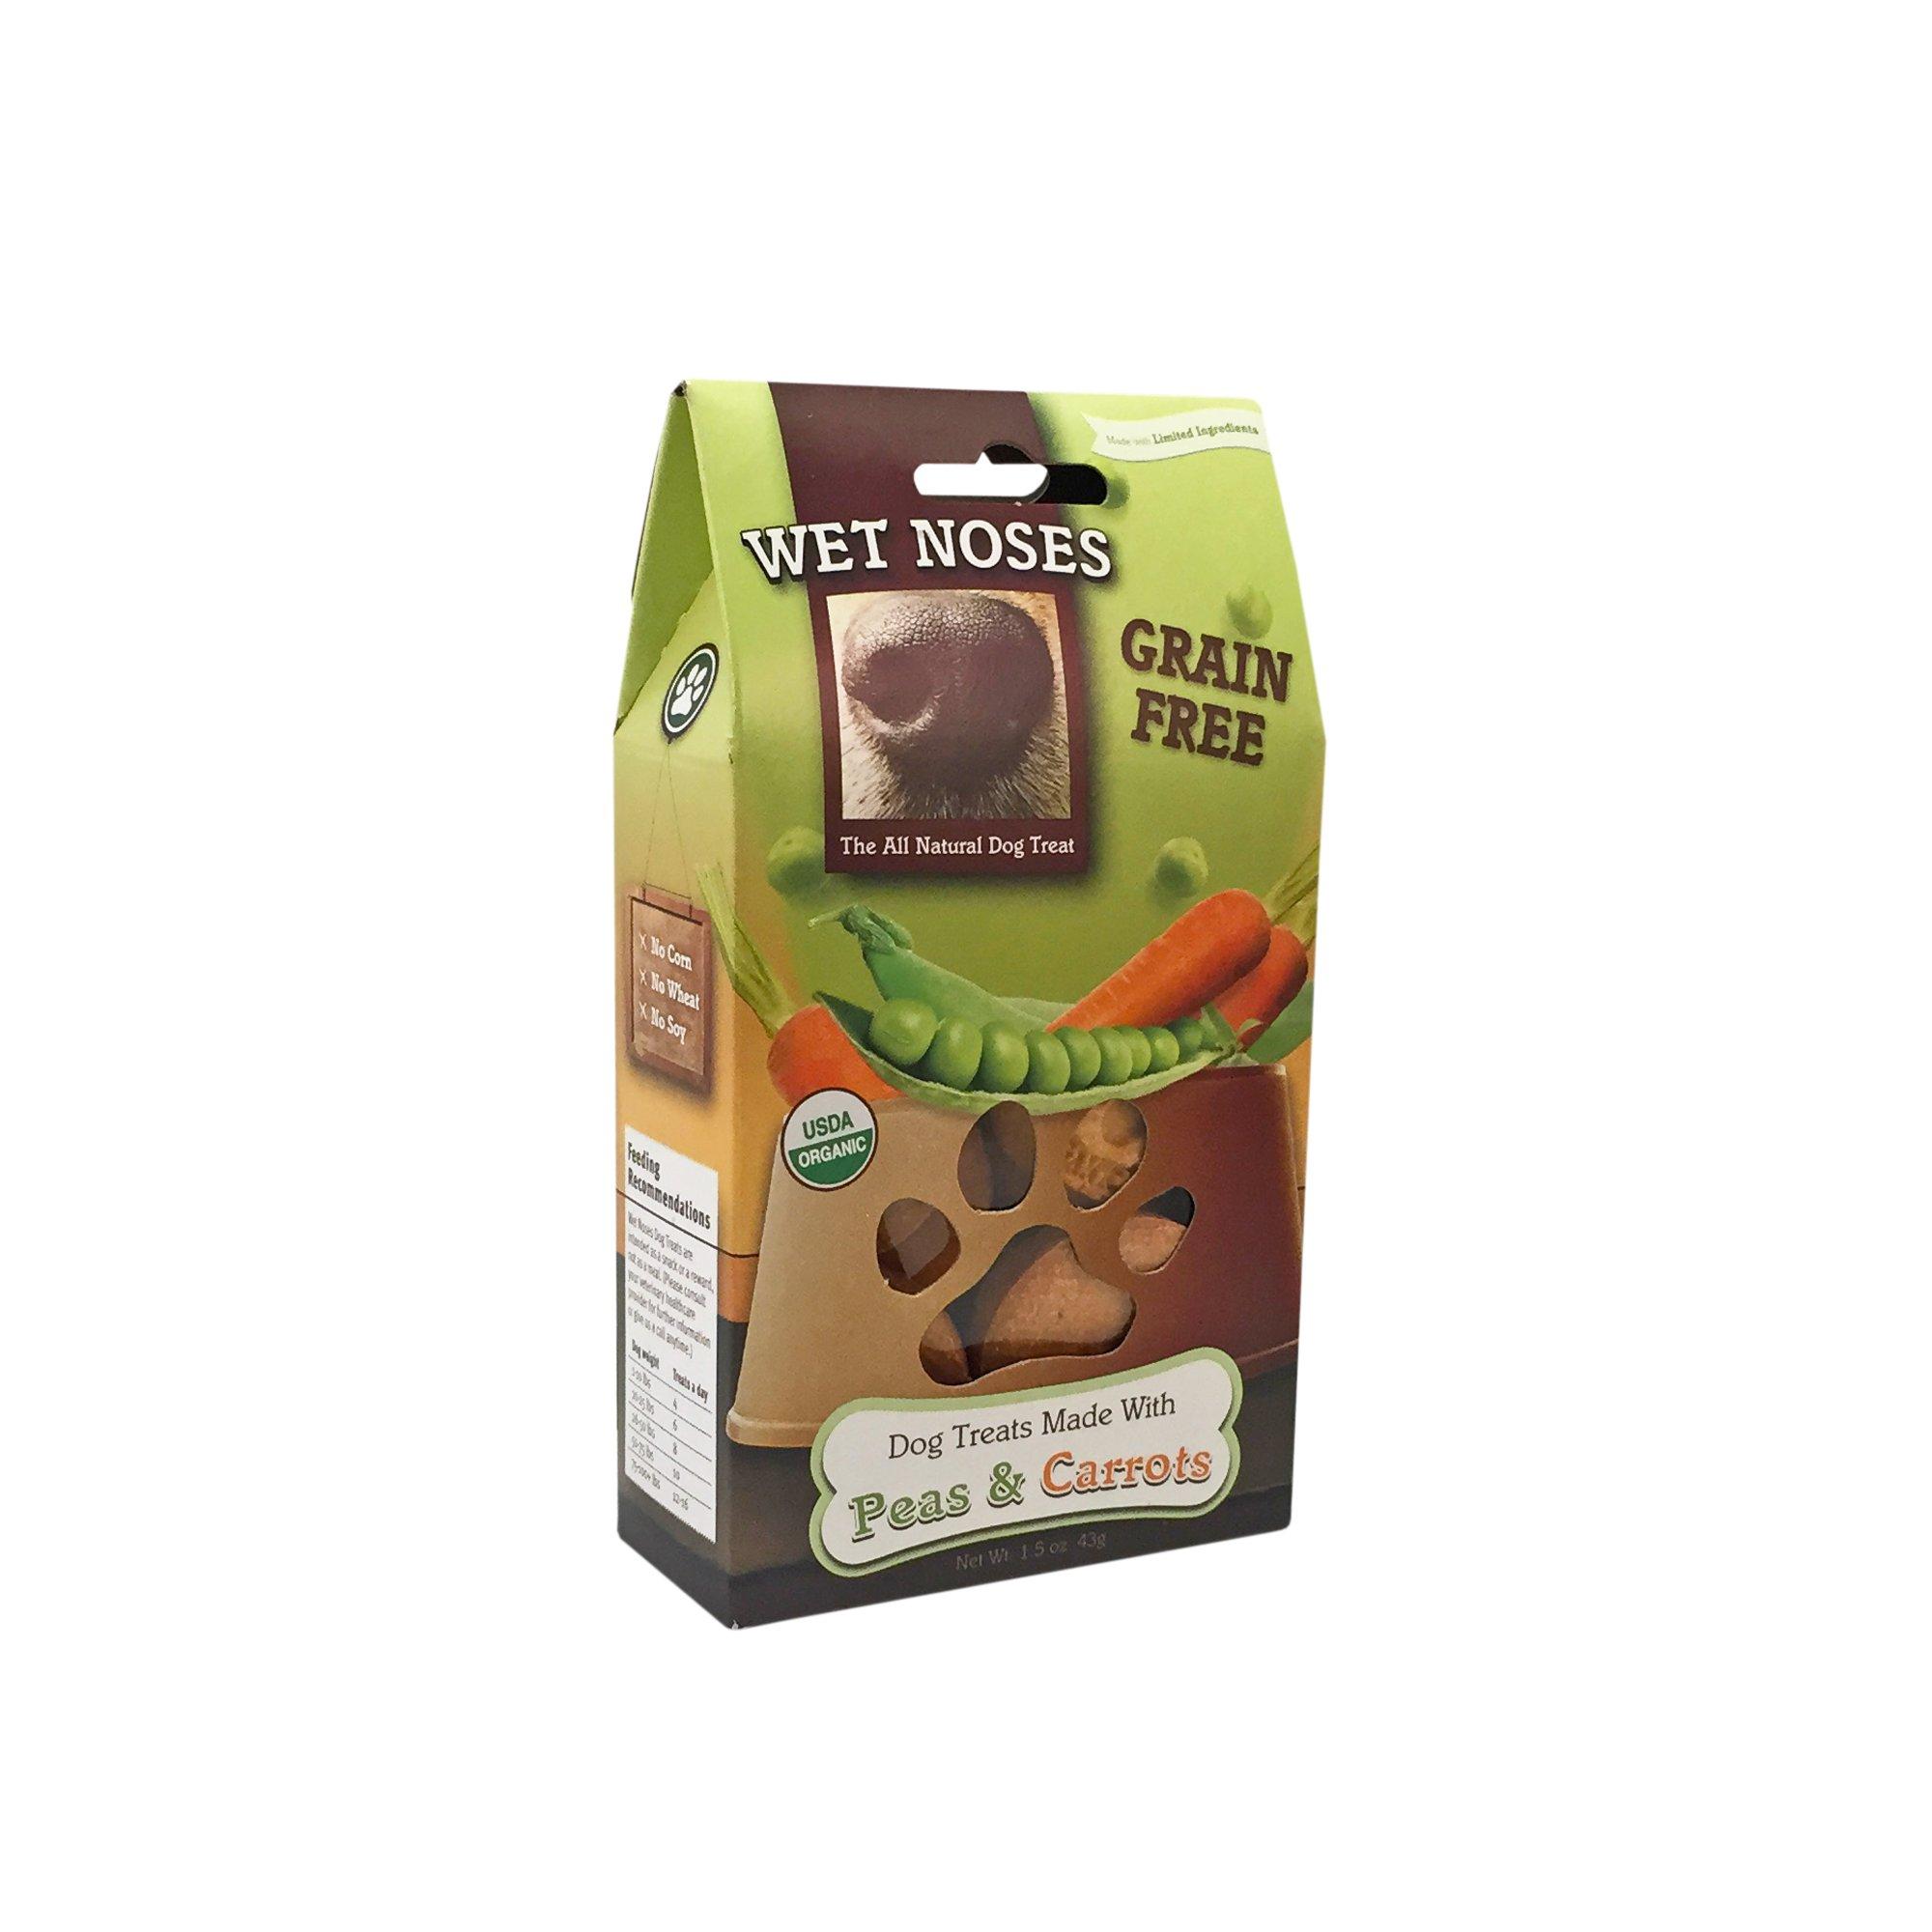 Wet Noses Grain Free Peas & Carrots Dog Treats